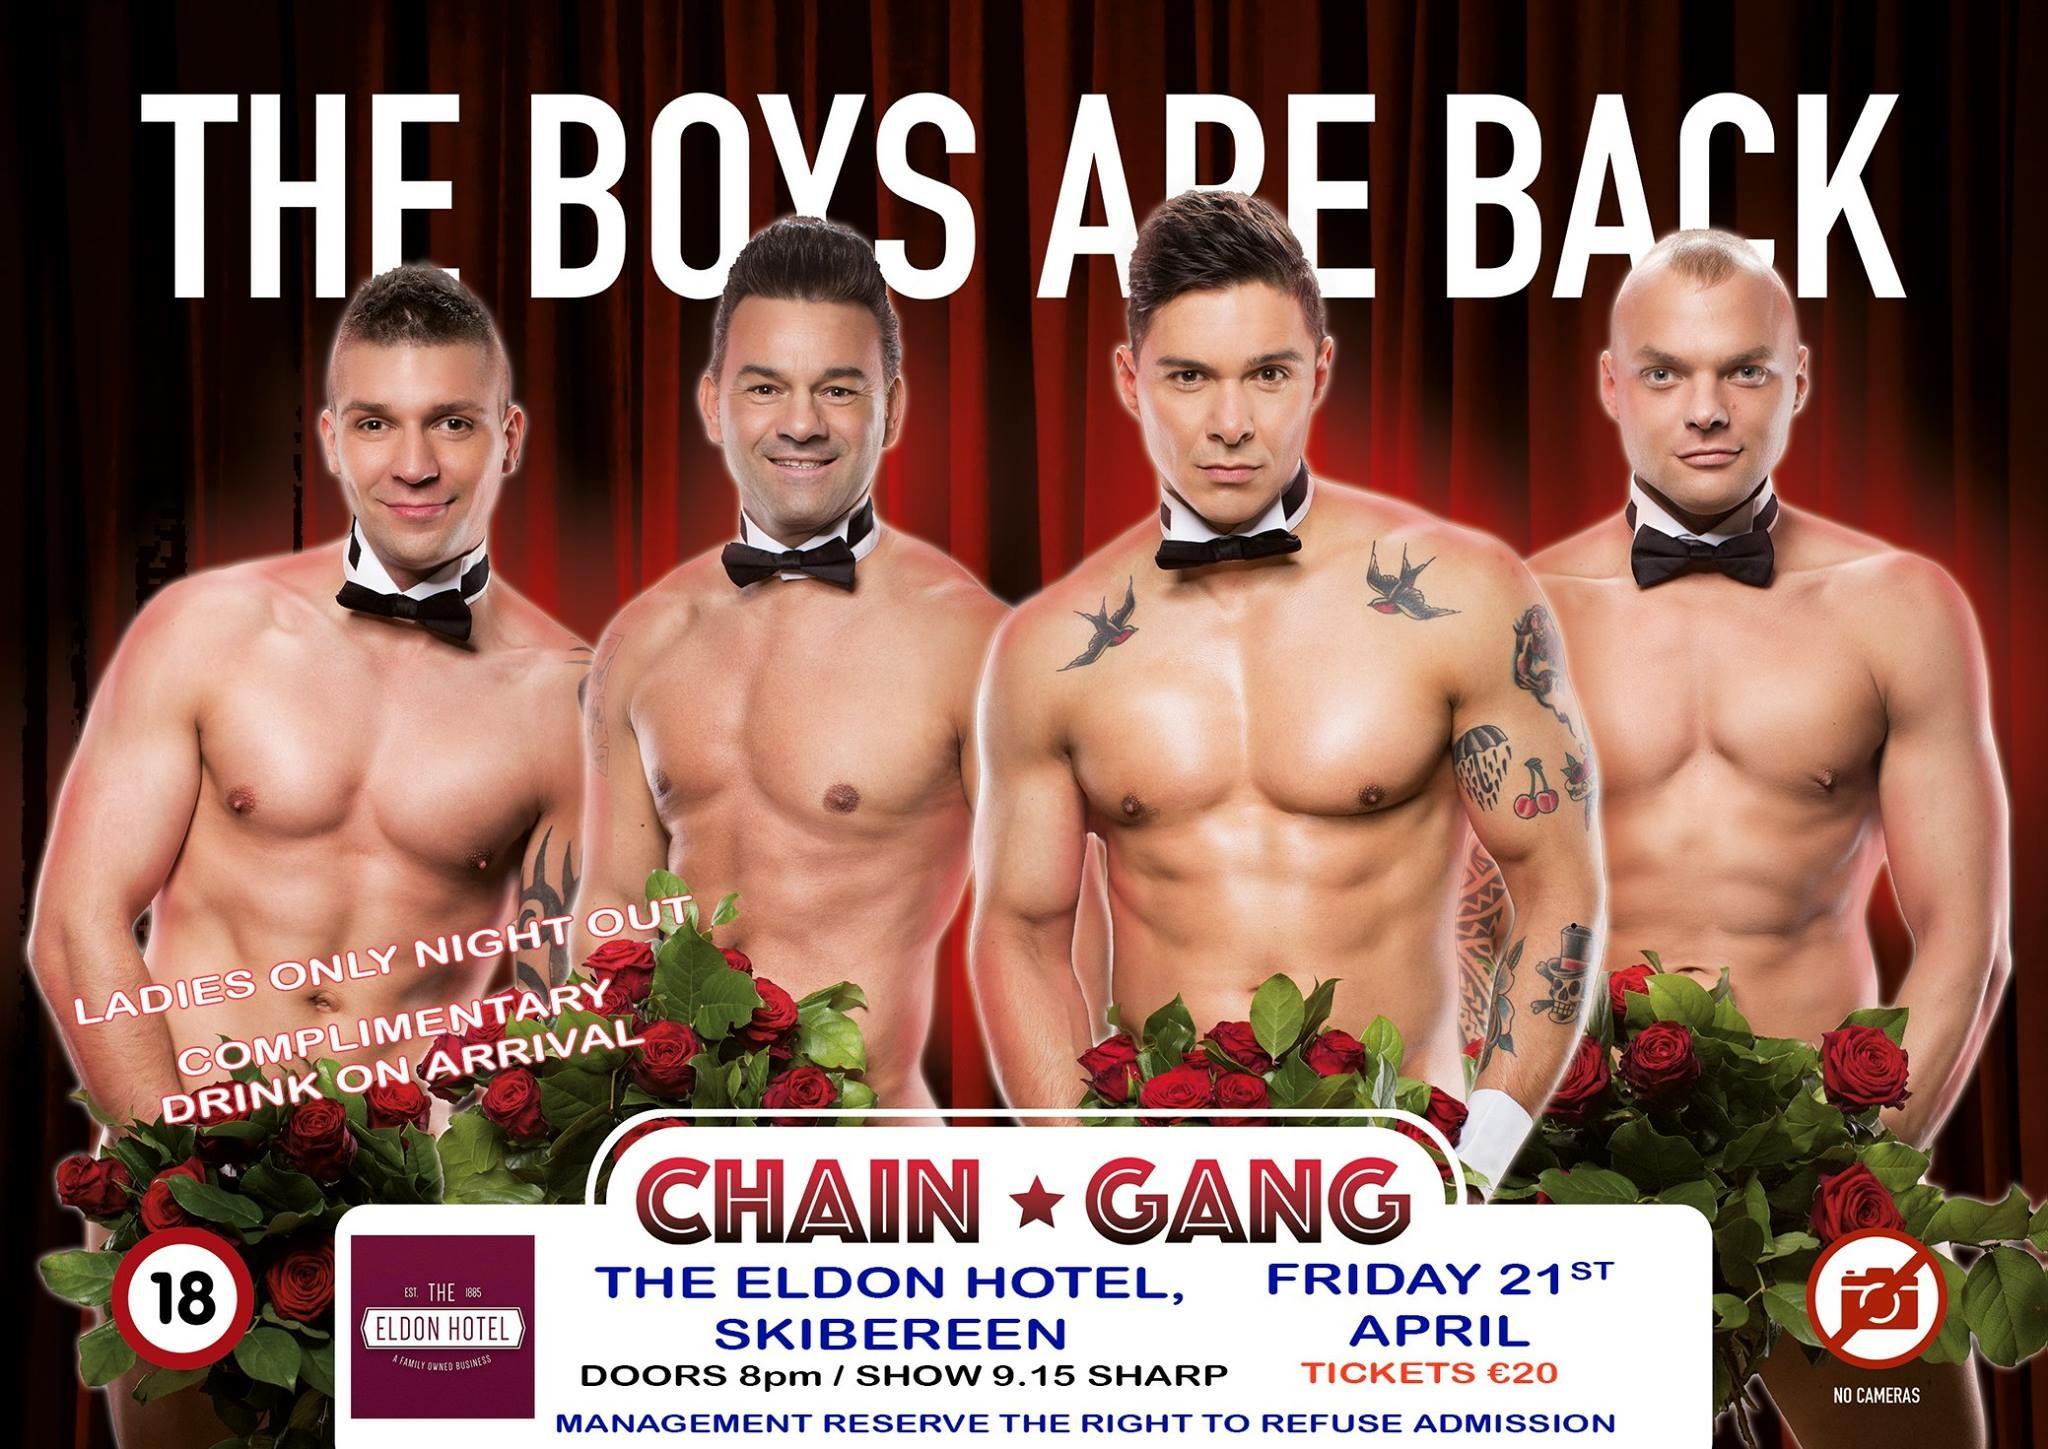 Chain Gang Eldon Hotel